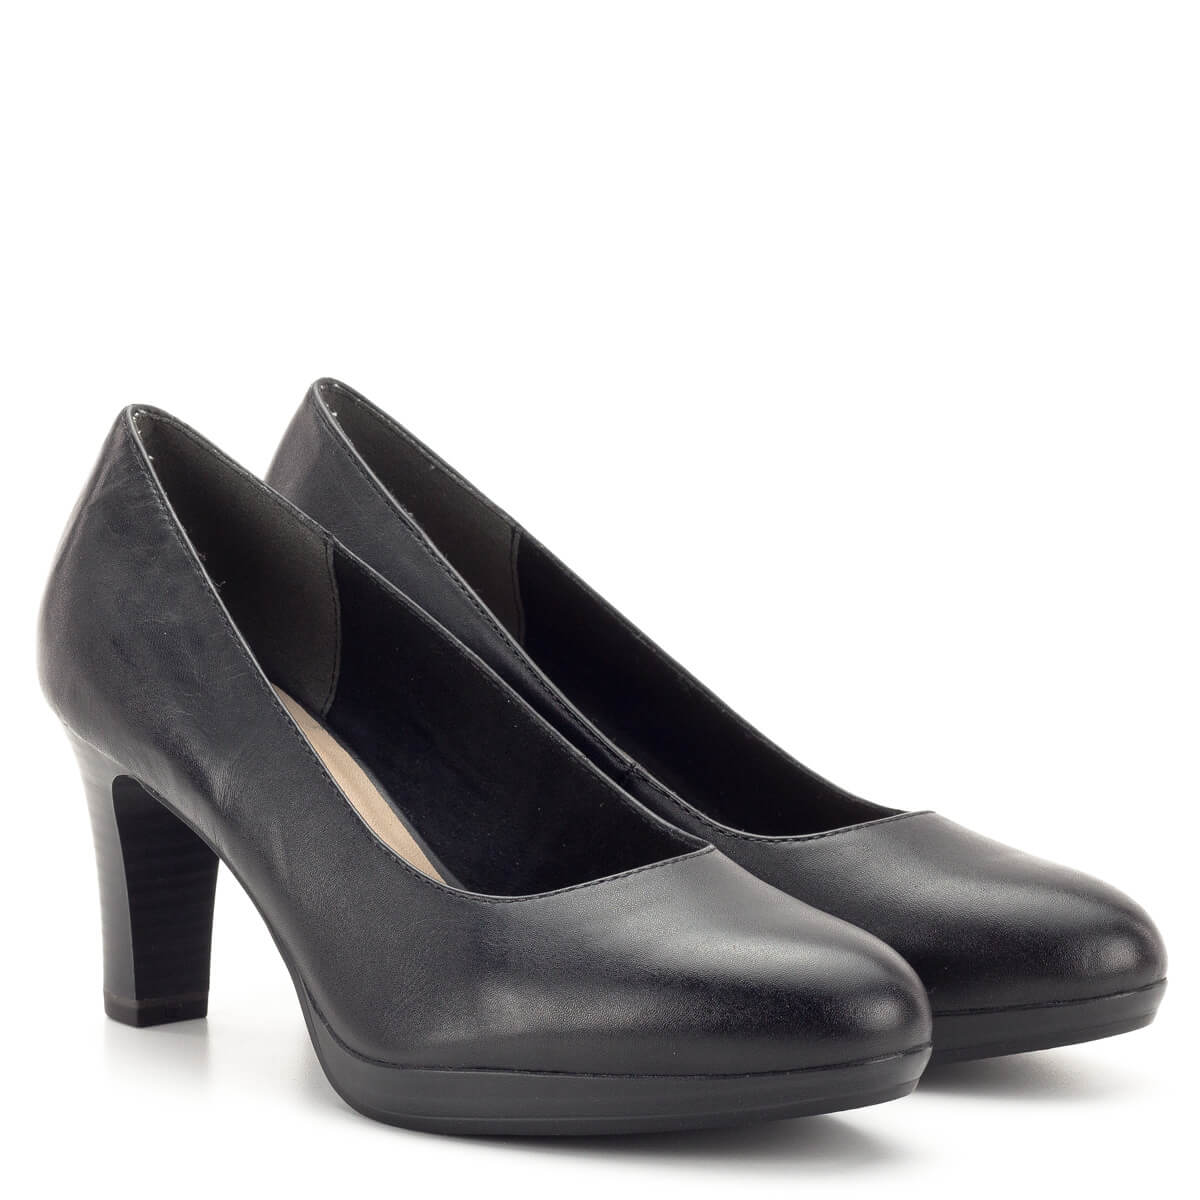 e092b3552c6a Tamaris cipő 7,5 cm magas sarokkal. A klasszikus Tamaris pumps szinte  minden alkalomra ...